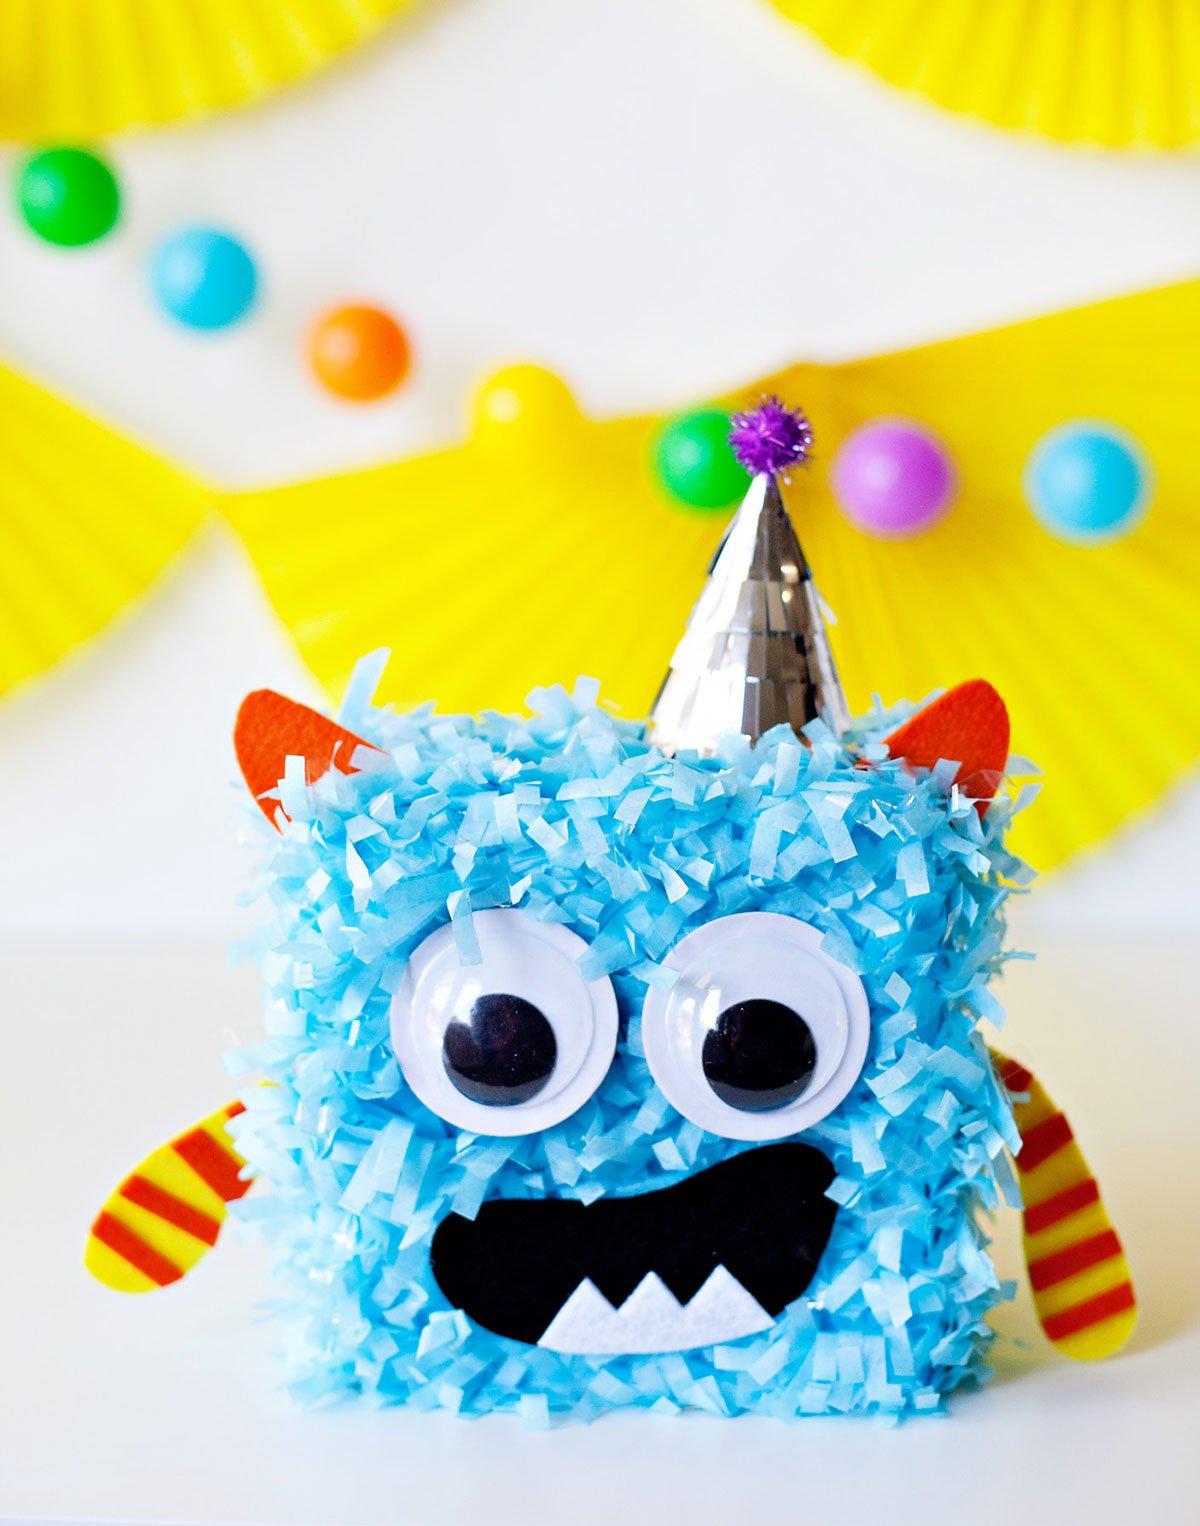 Cute Monster Party - Monster Centerpiece Blue